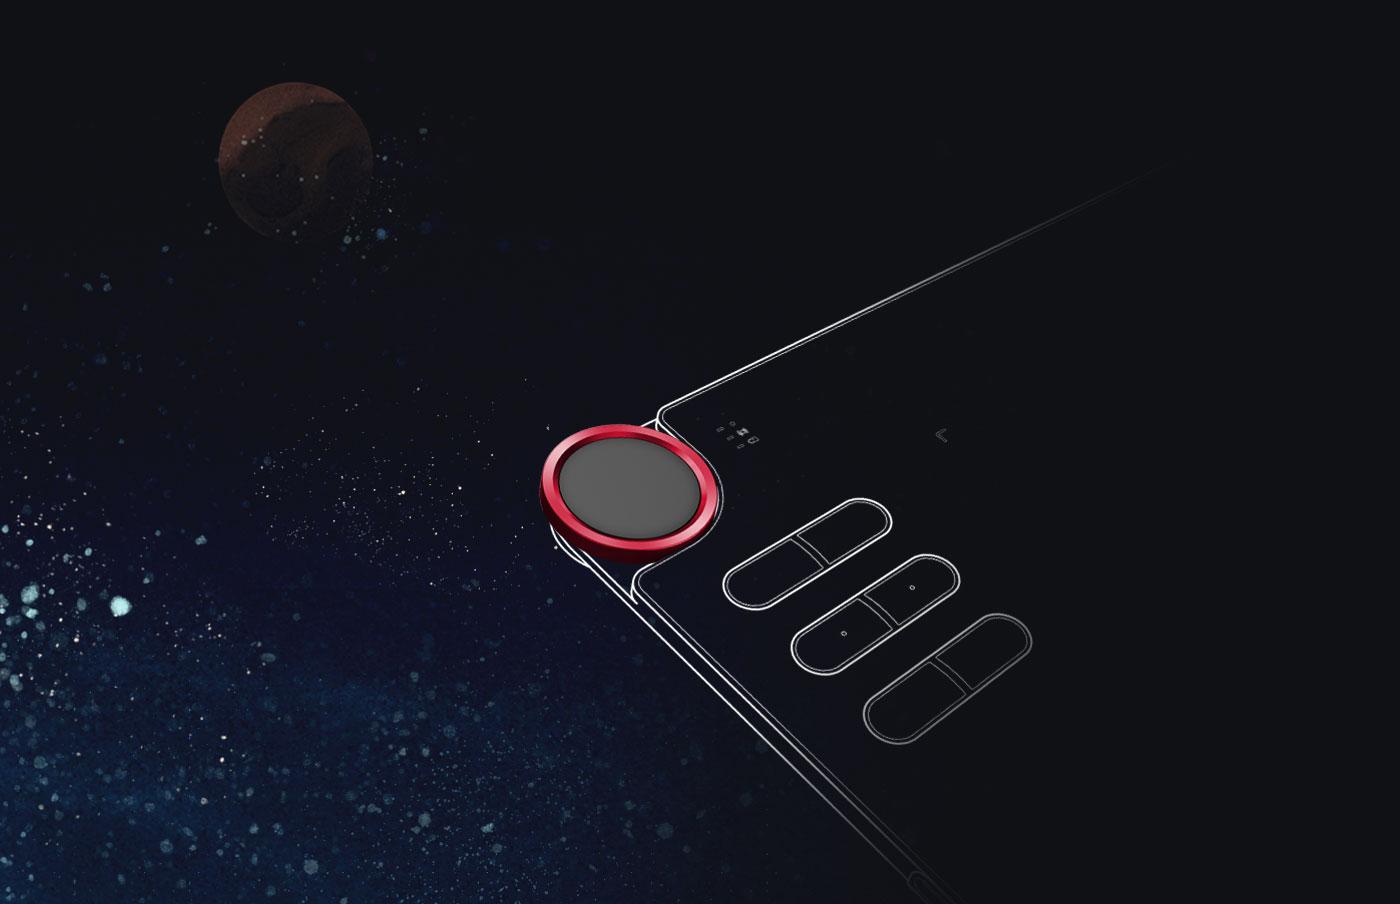 XP-Pen Deco 03 Tableta Con Un Dial Rojo Multifuncional Maravilloso